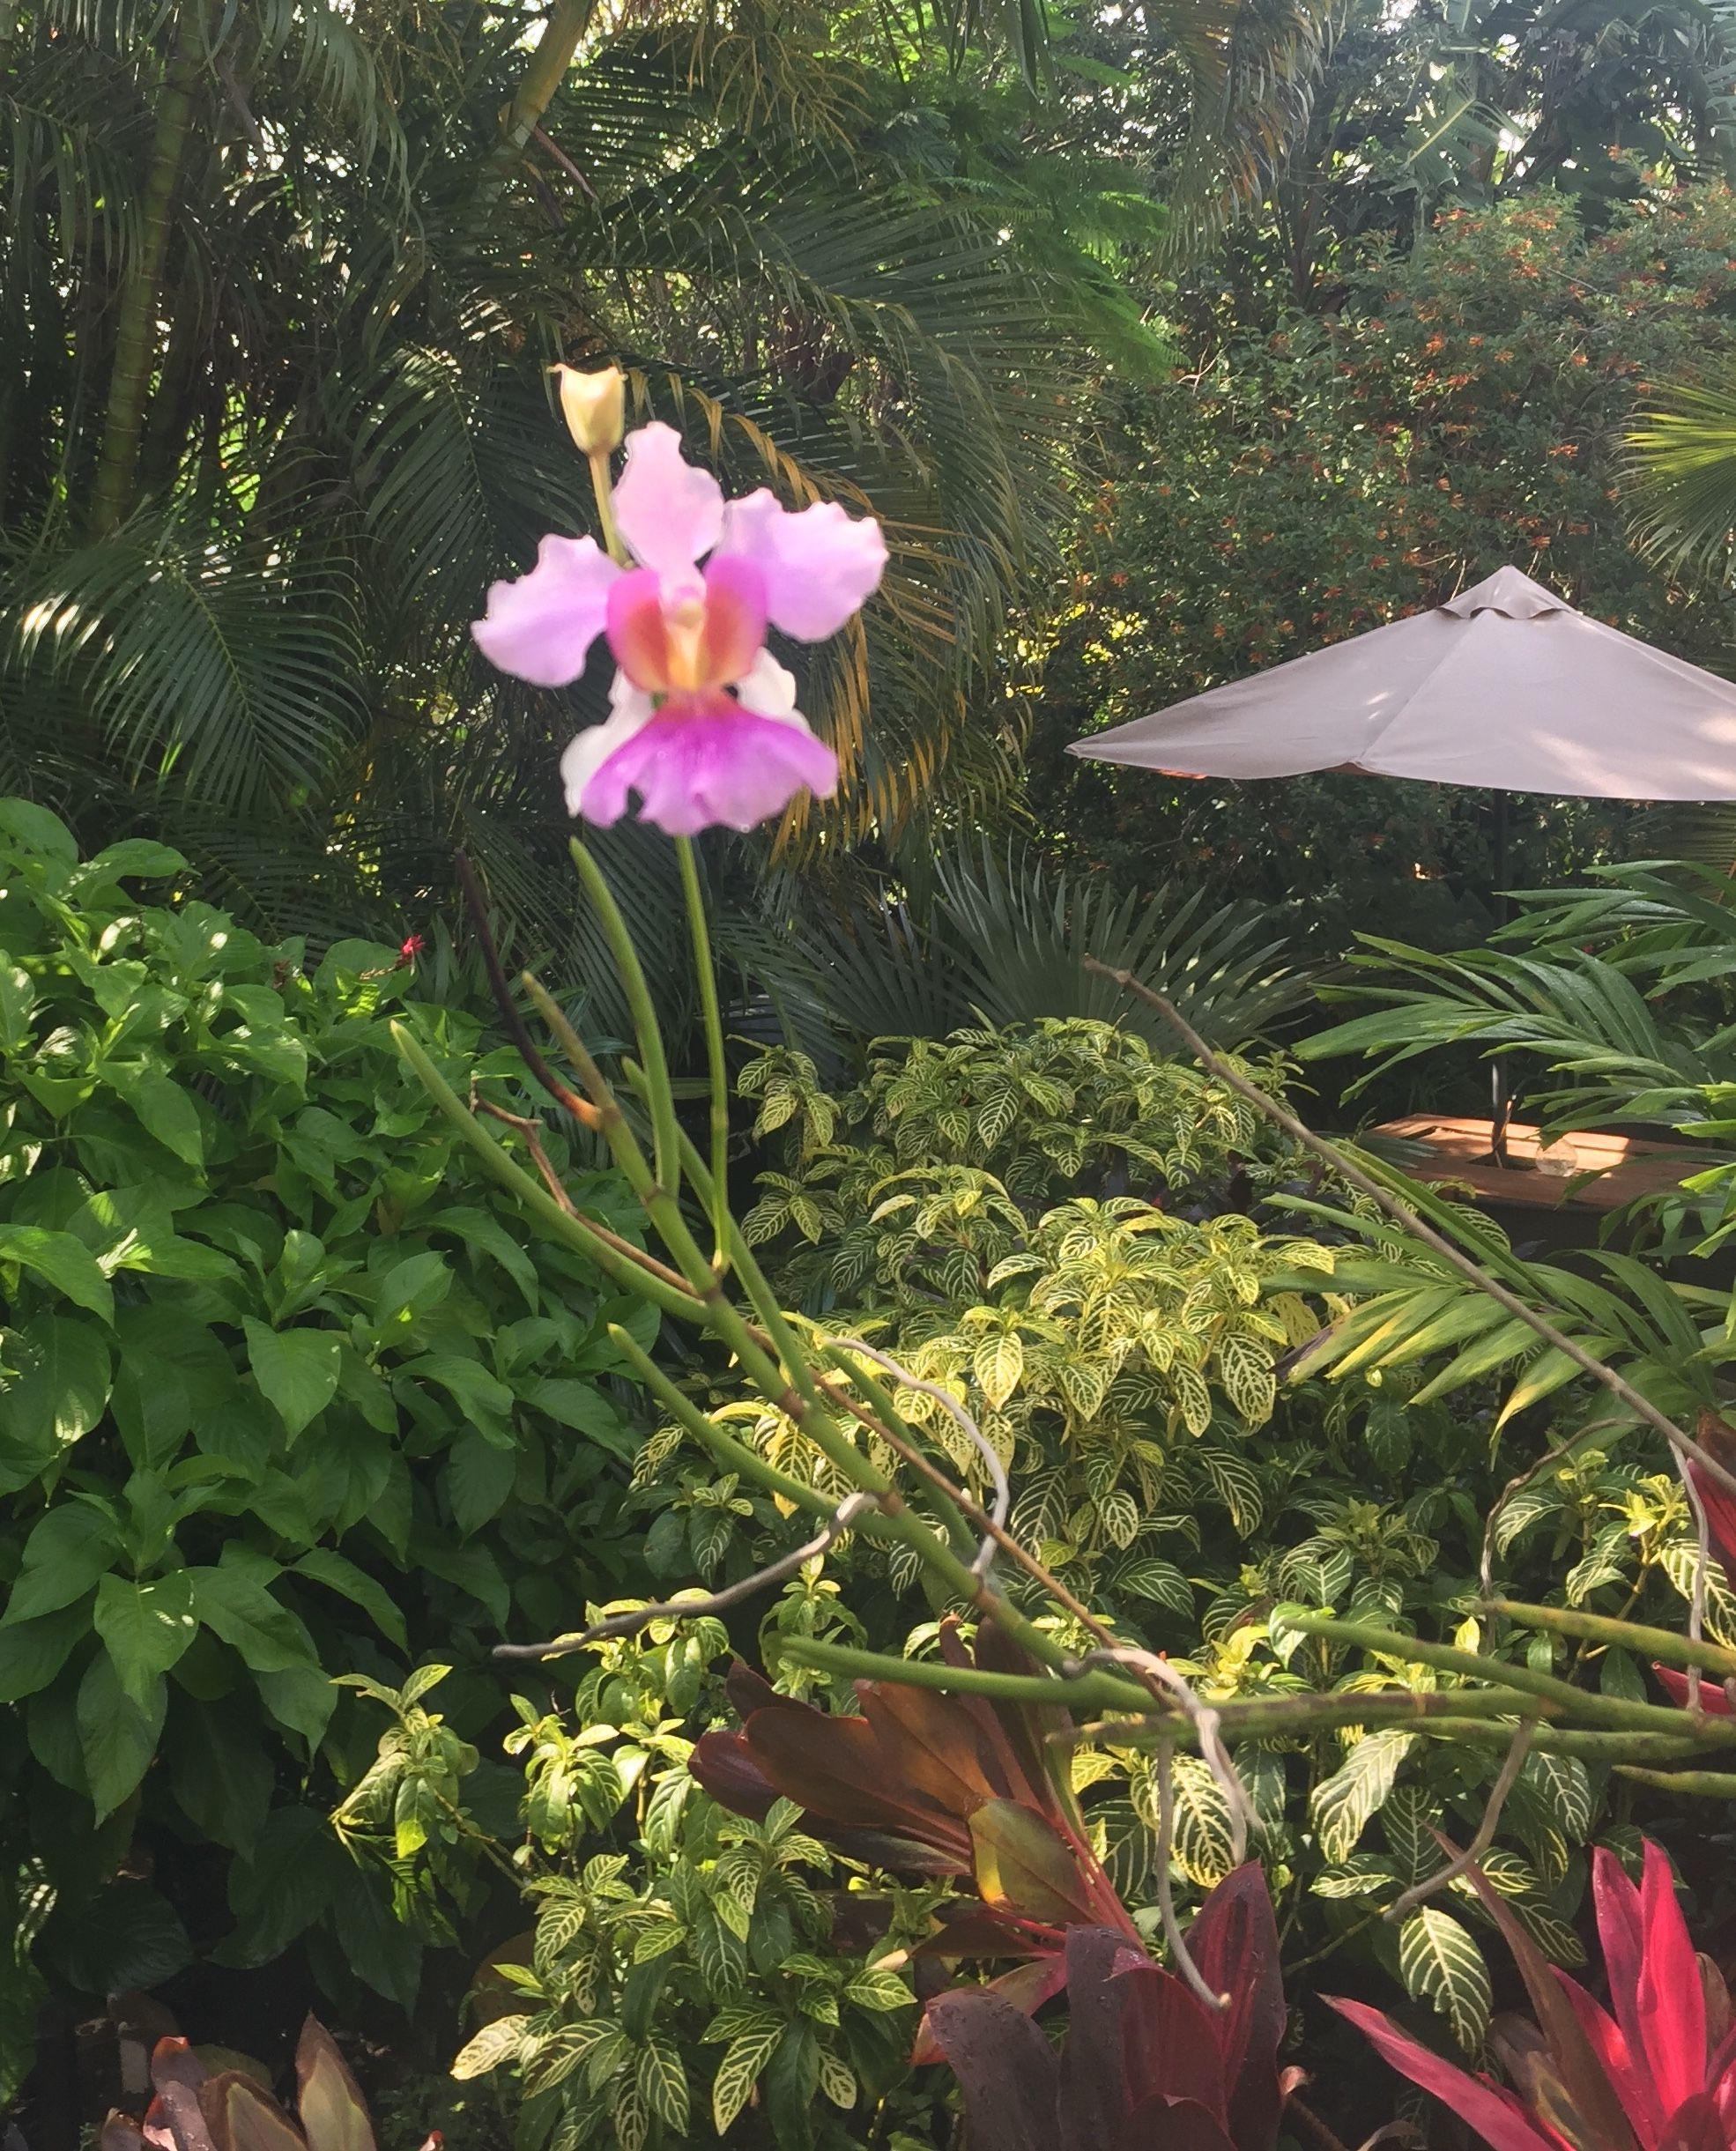 Arundina graminifolia, the Bamboo Orchid, produces pinkish